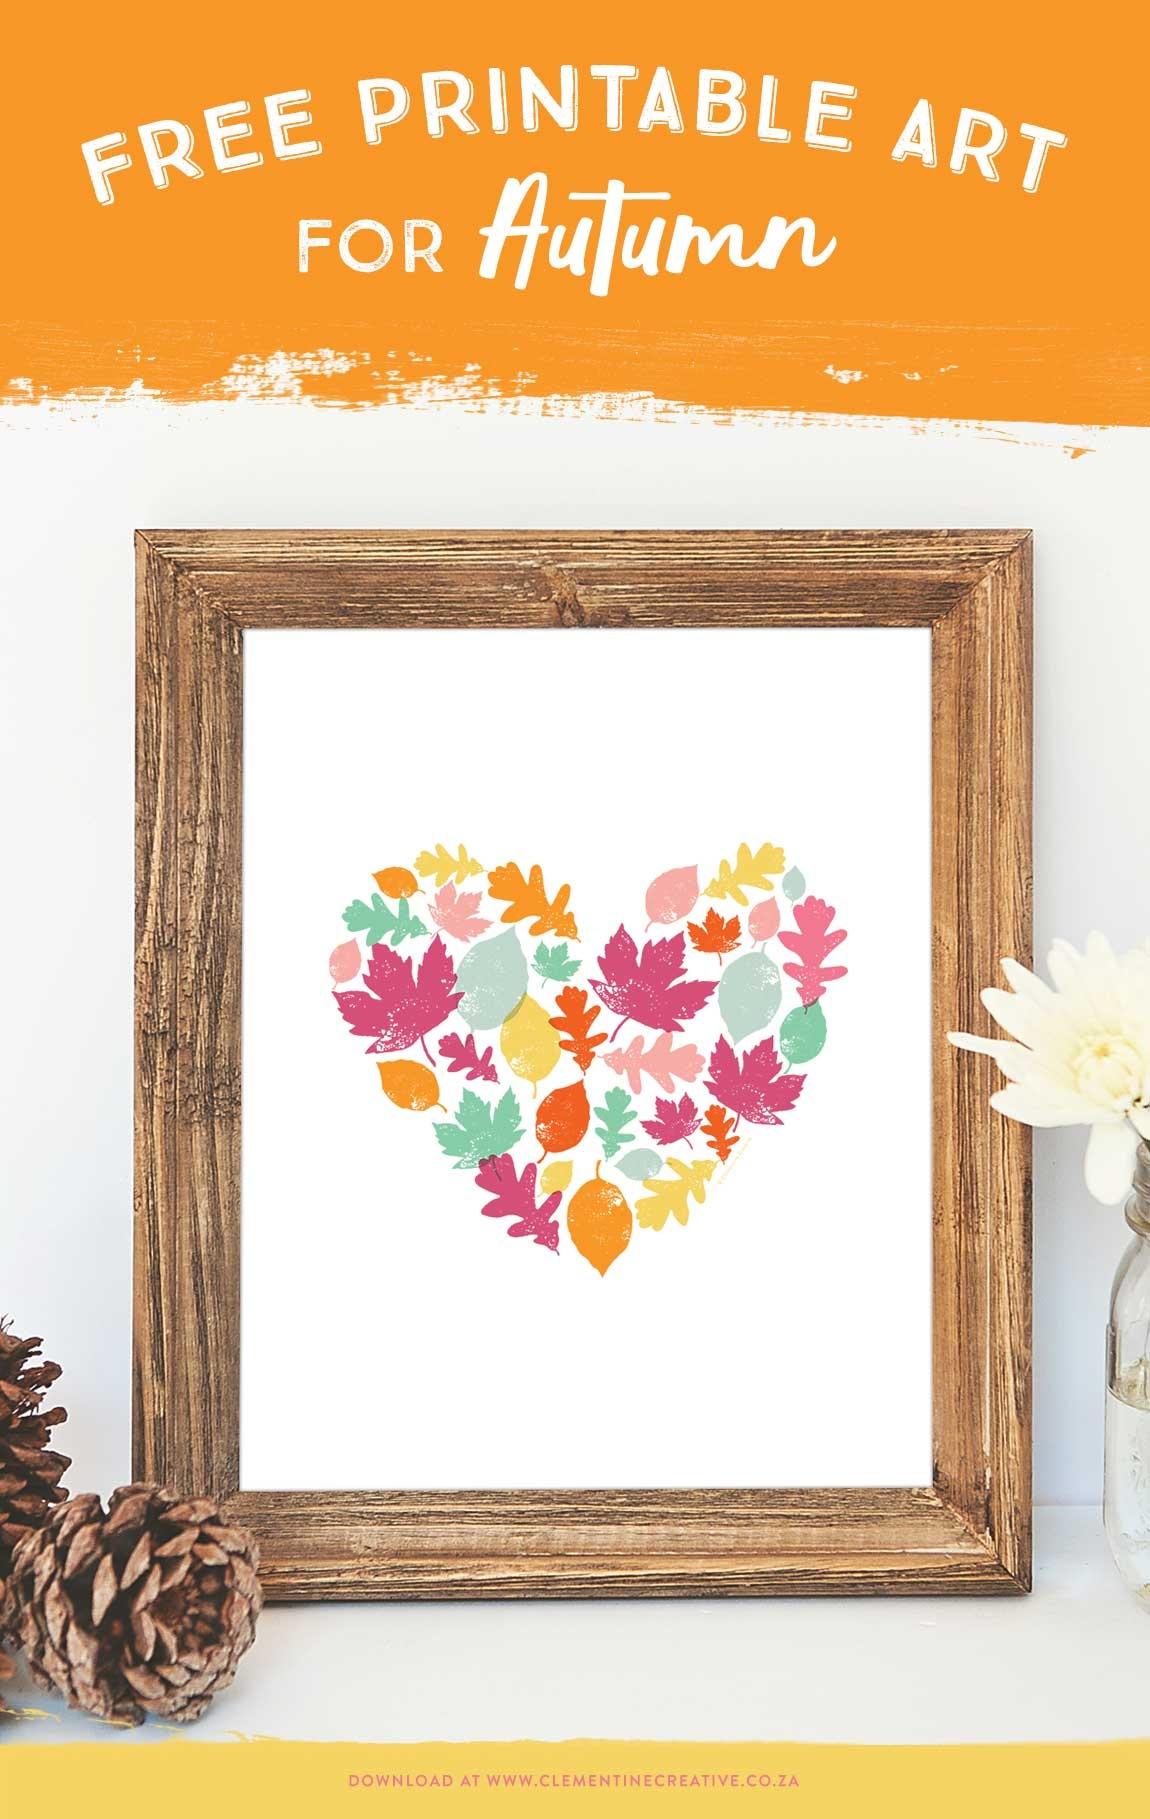 Autumn Leaves Art Print - Free Printable Art For Your Home - Free Printable Artwork To Frame